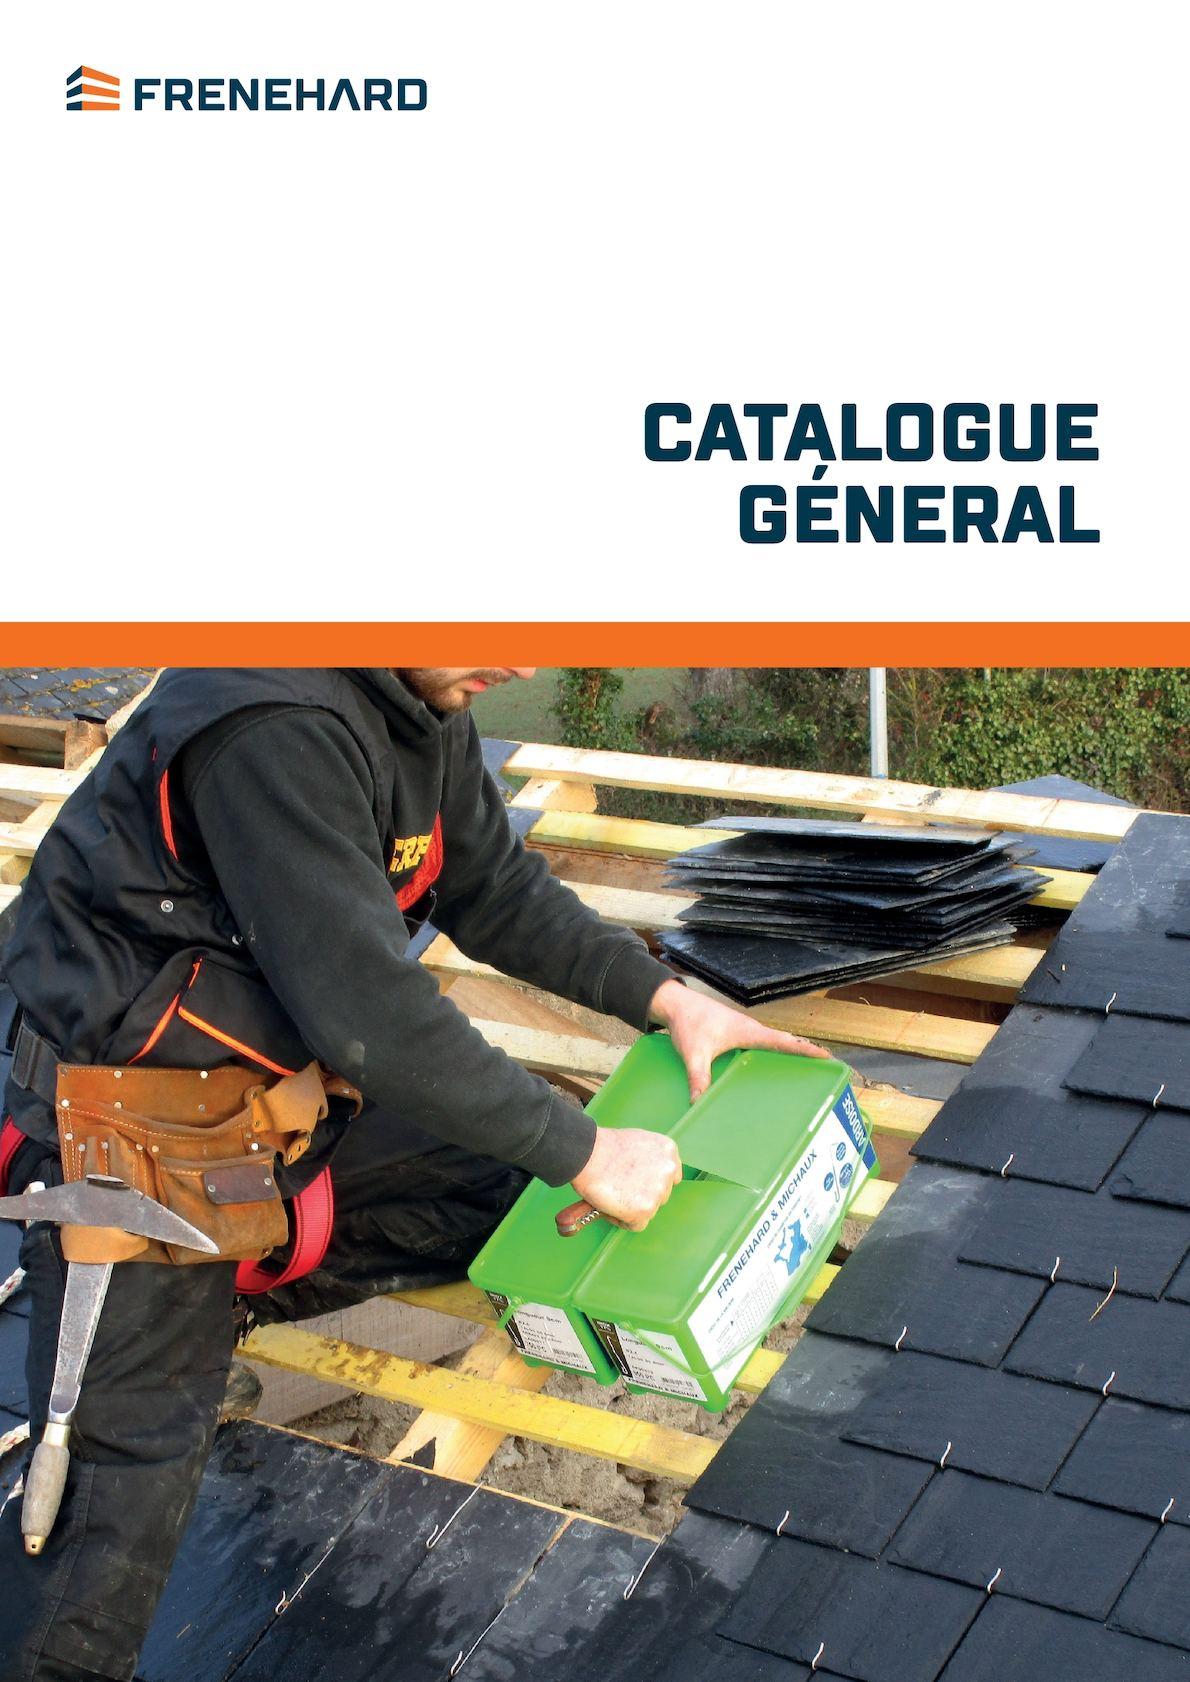 Calaméo - Frenehard   Michaux Catalogue General 2015 5d2c29fe736